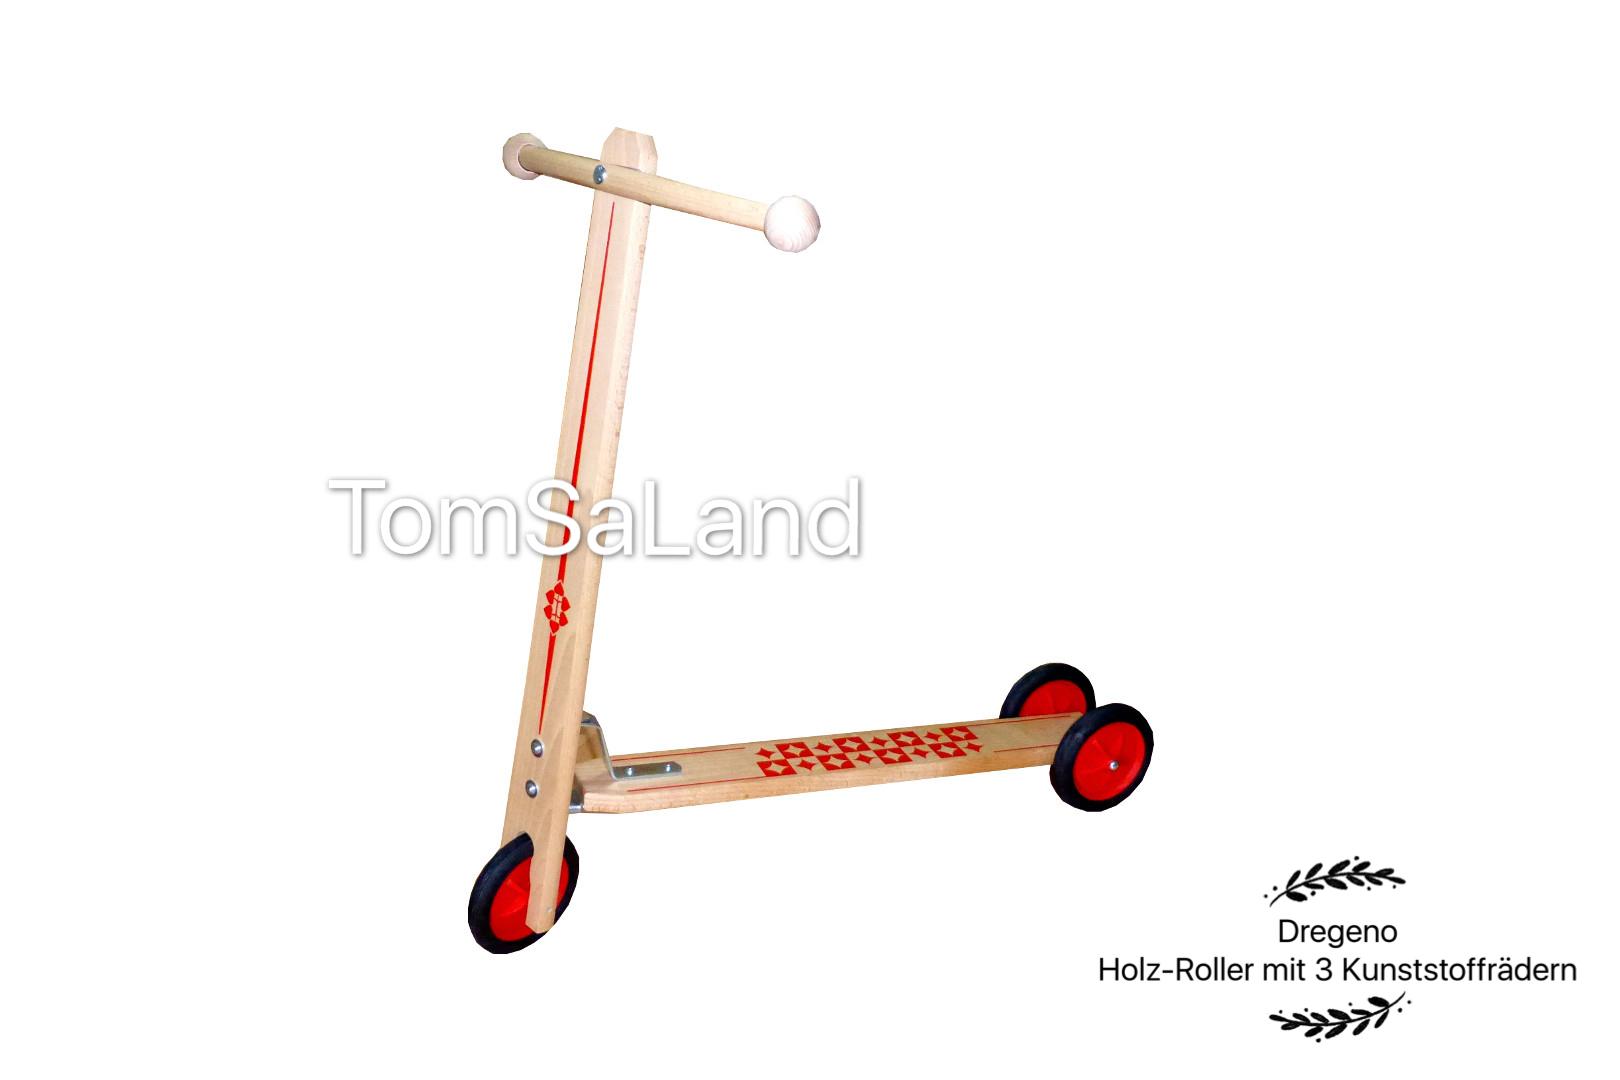 TomSaLand_Holz-Roller_Roller_mit_3_Kunststoffradern_Homepagebilder_Mit_Logo